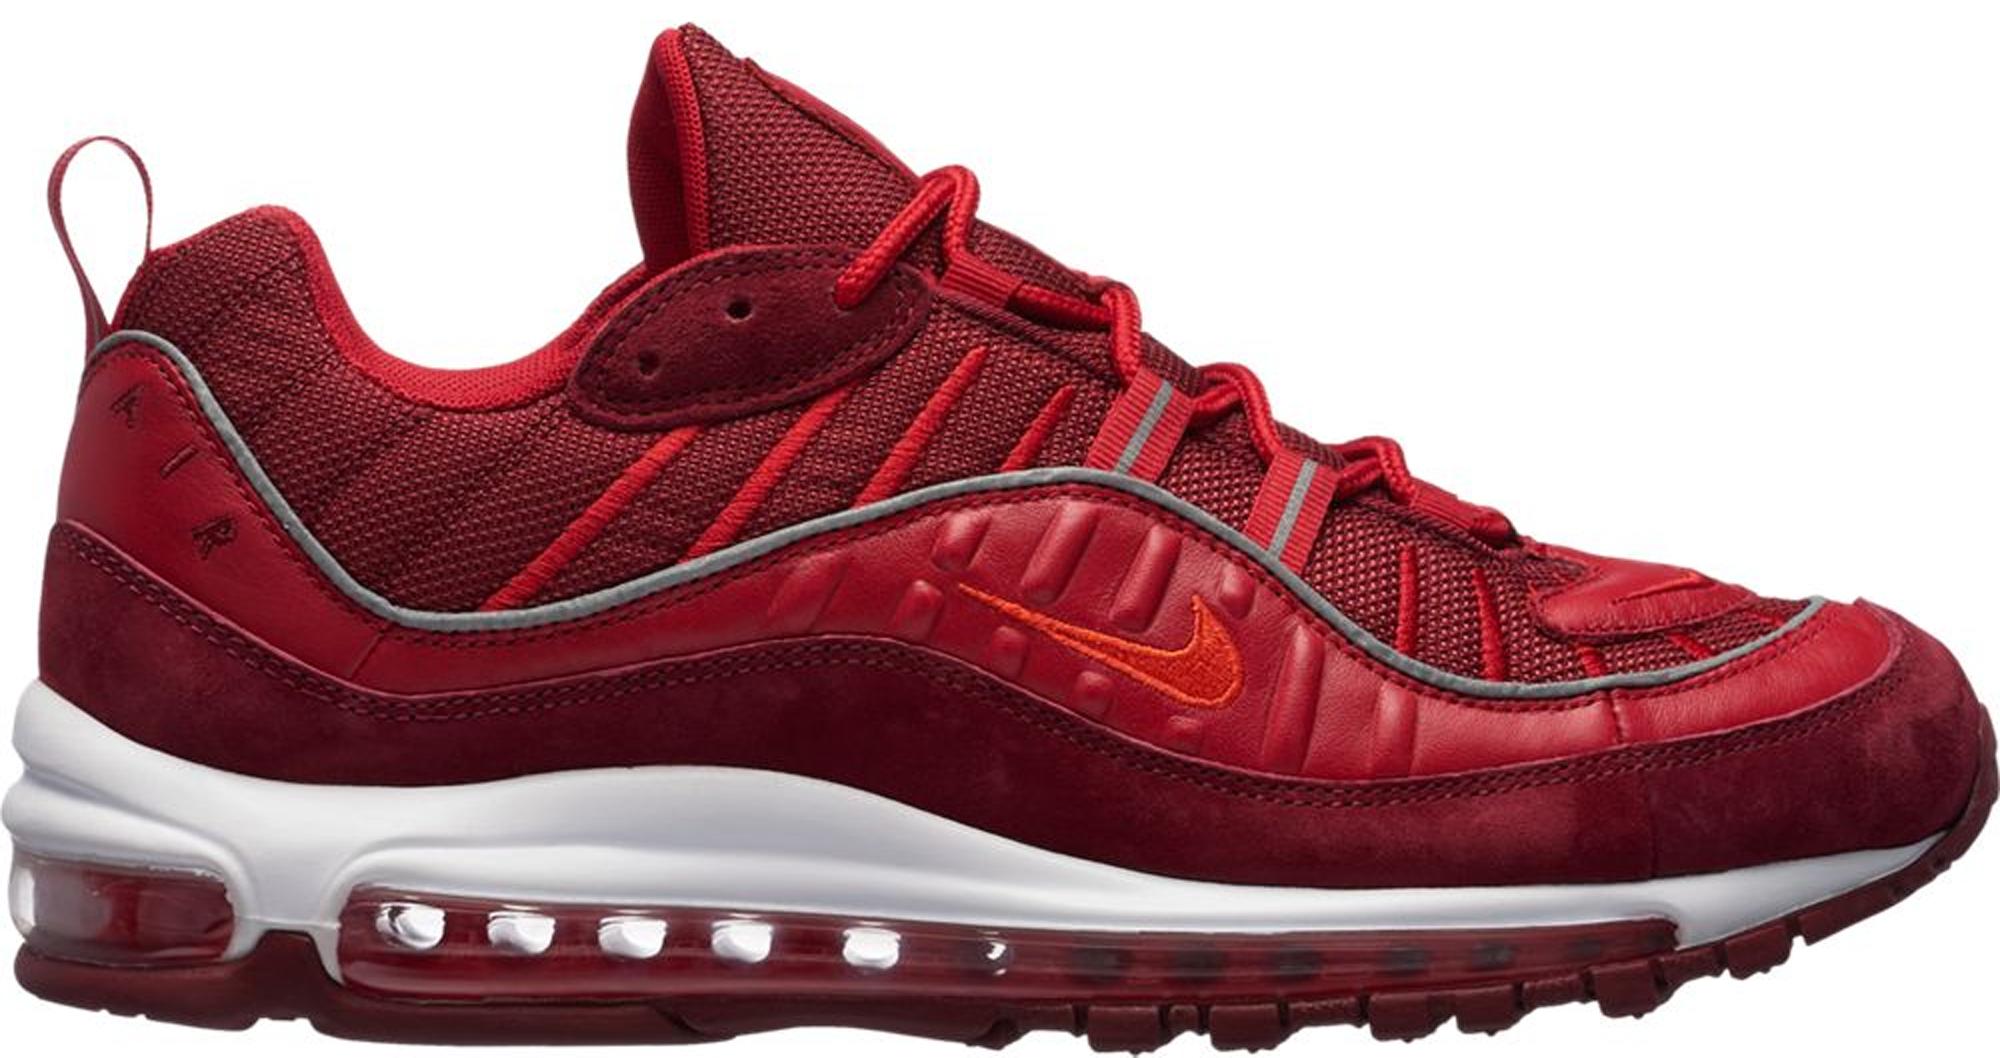 Nike Air Max 98 Triple Red - AO9380-600